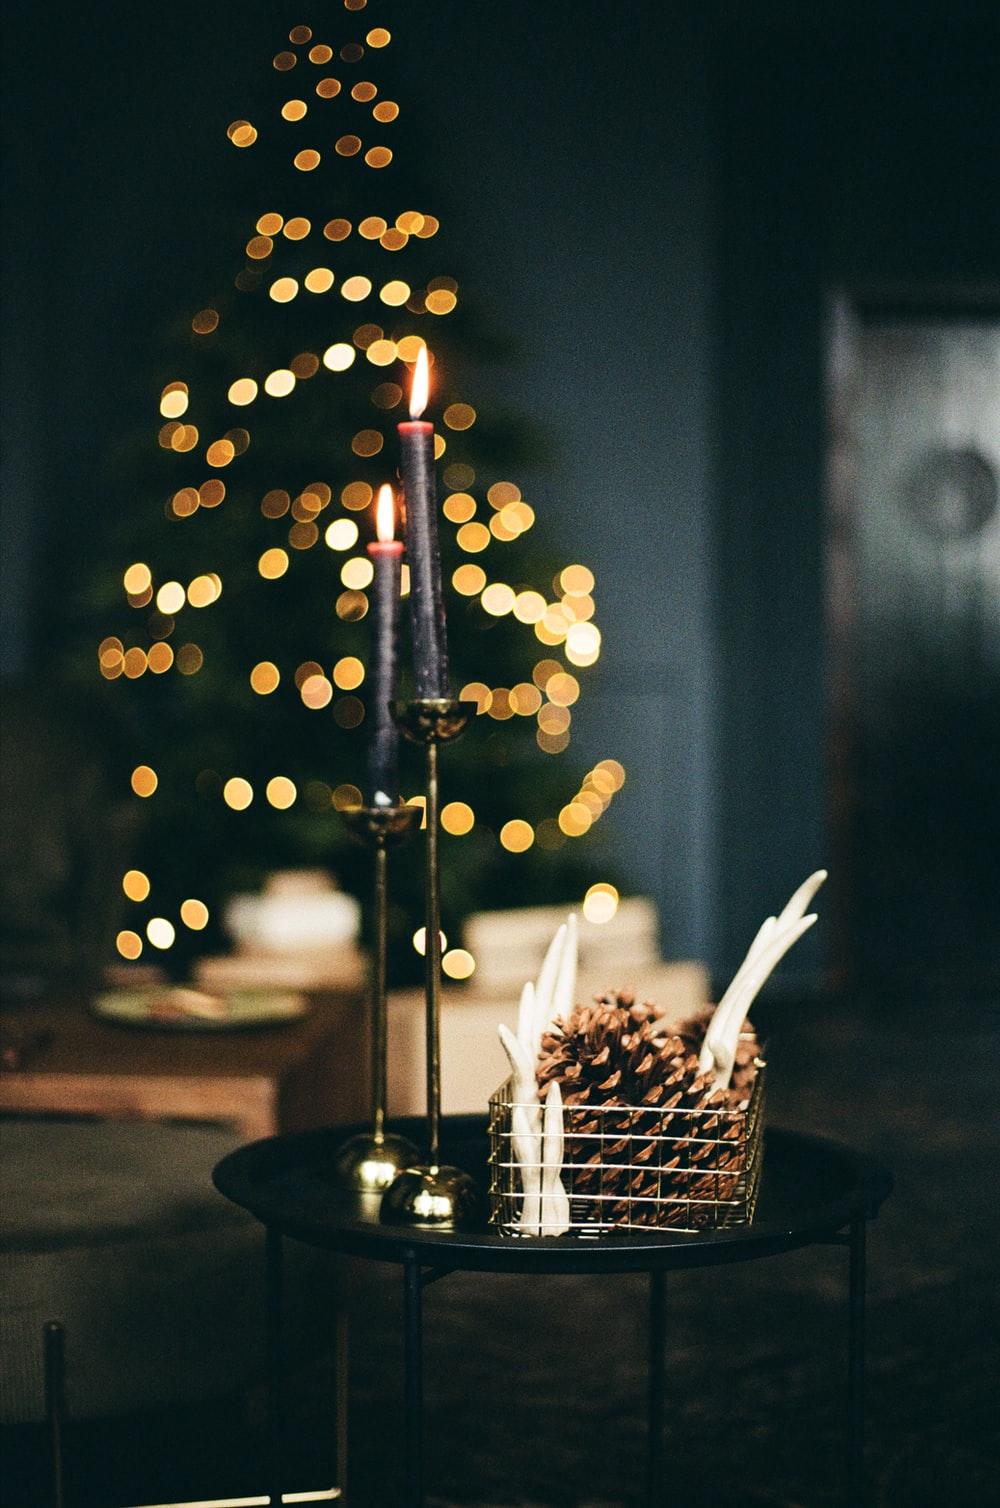 lighted candle on black metal holder